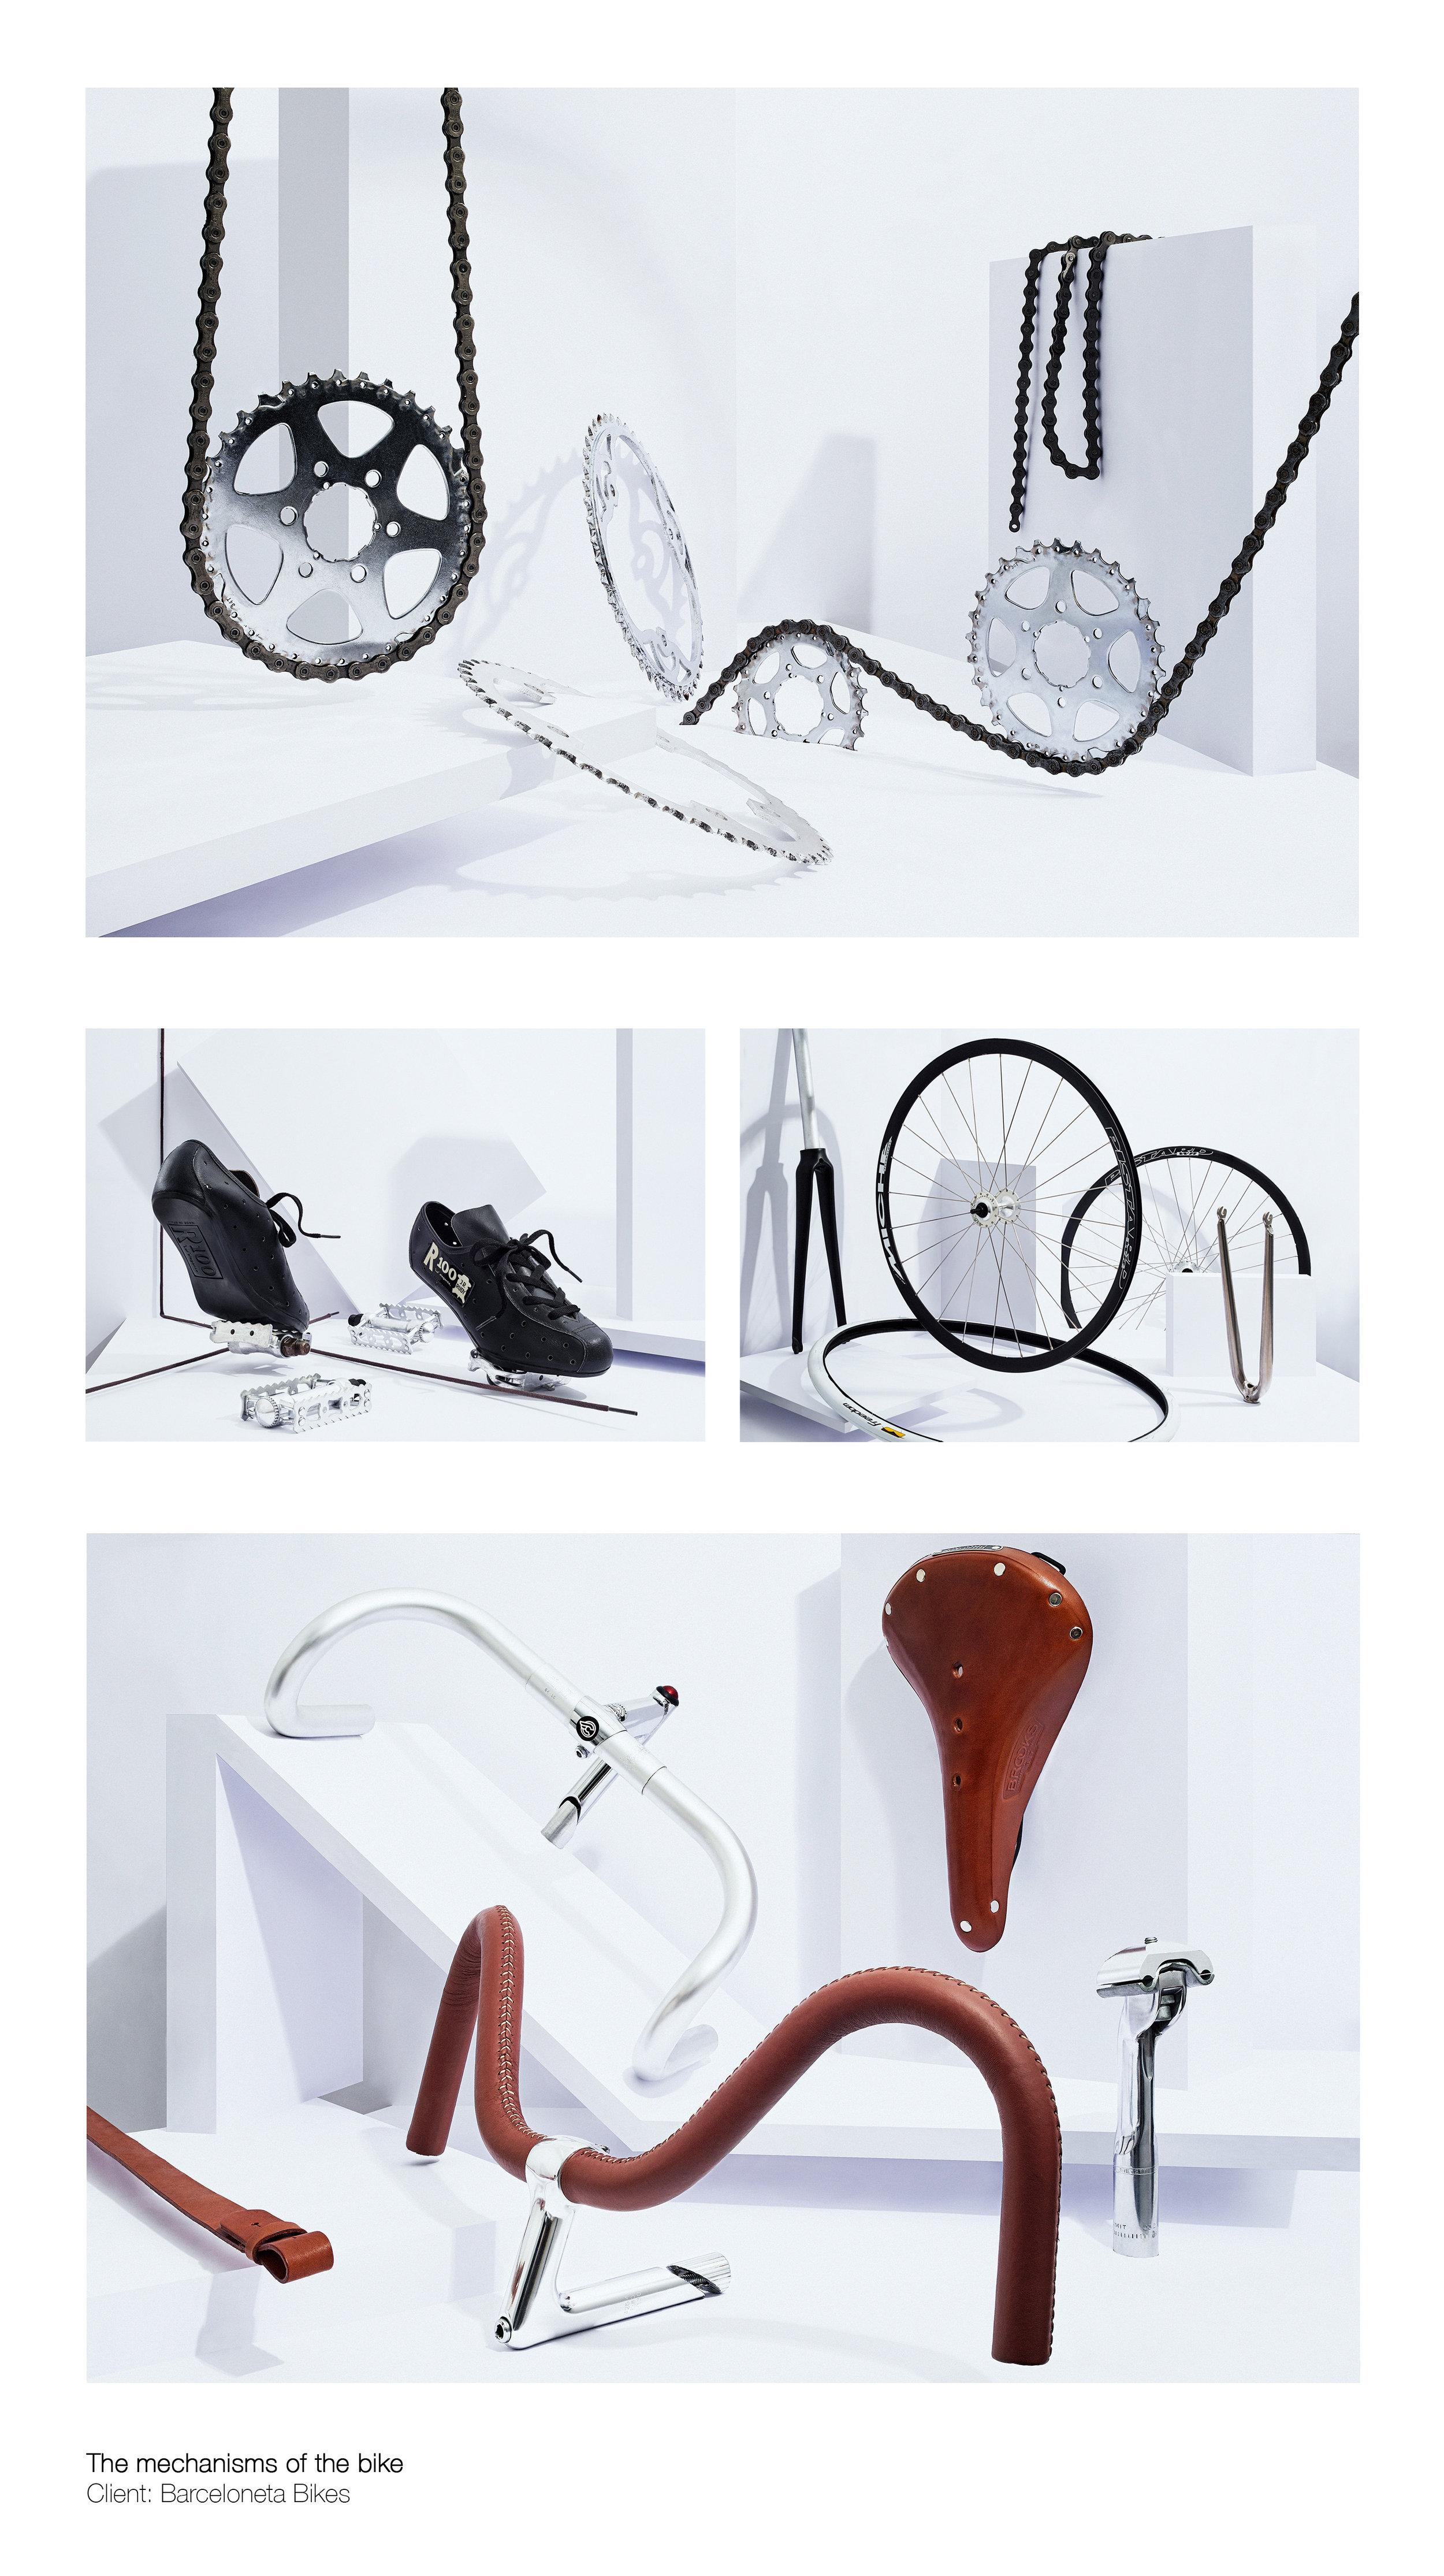 Mechanicims of the bike.jpg